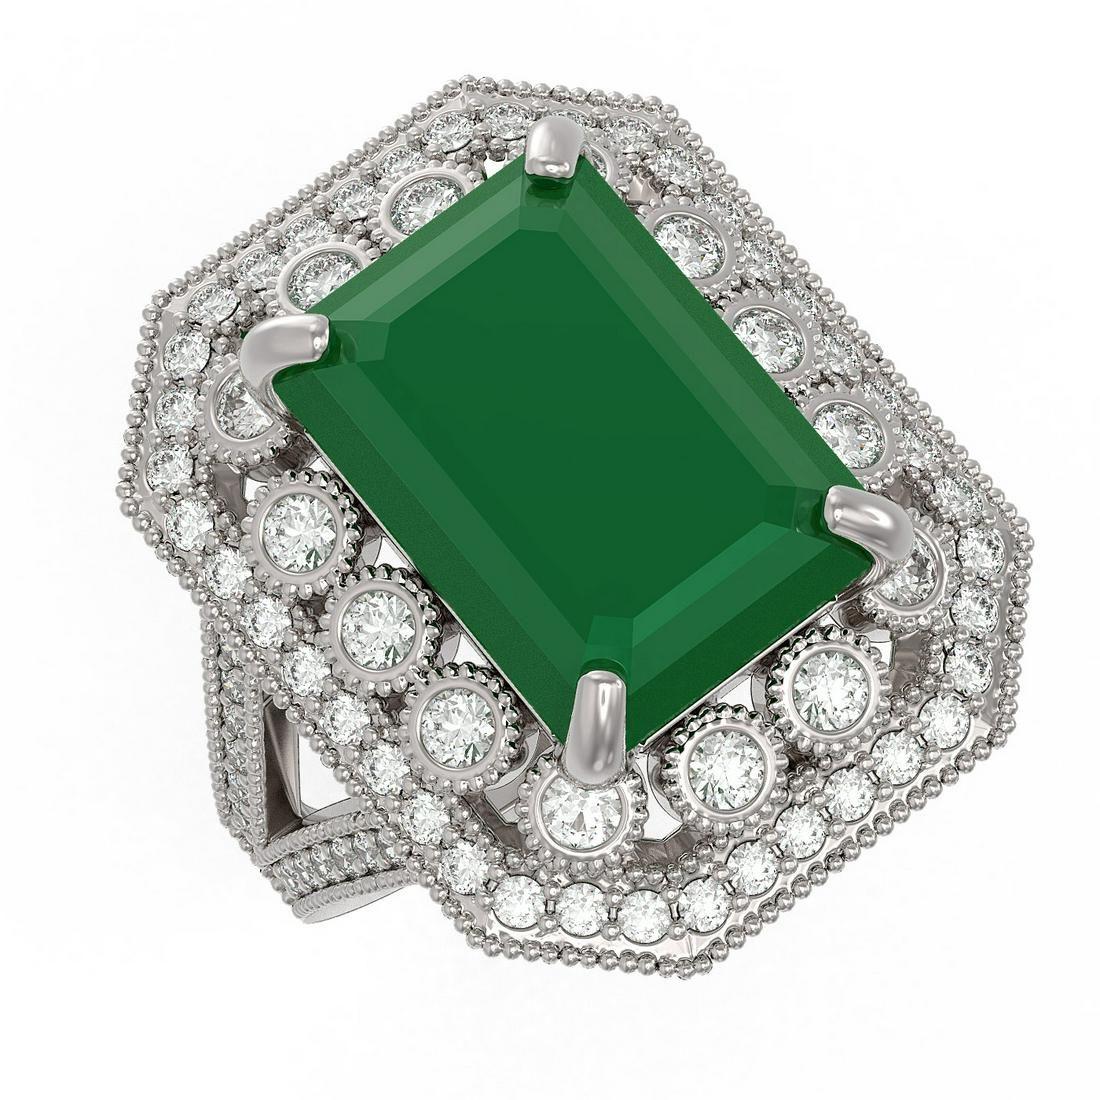 11.98 ctw Certified Emerald & Diamond Victorian Ring